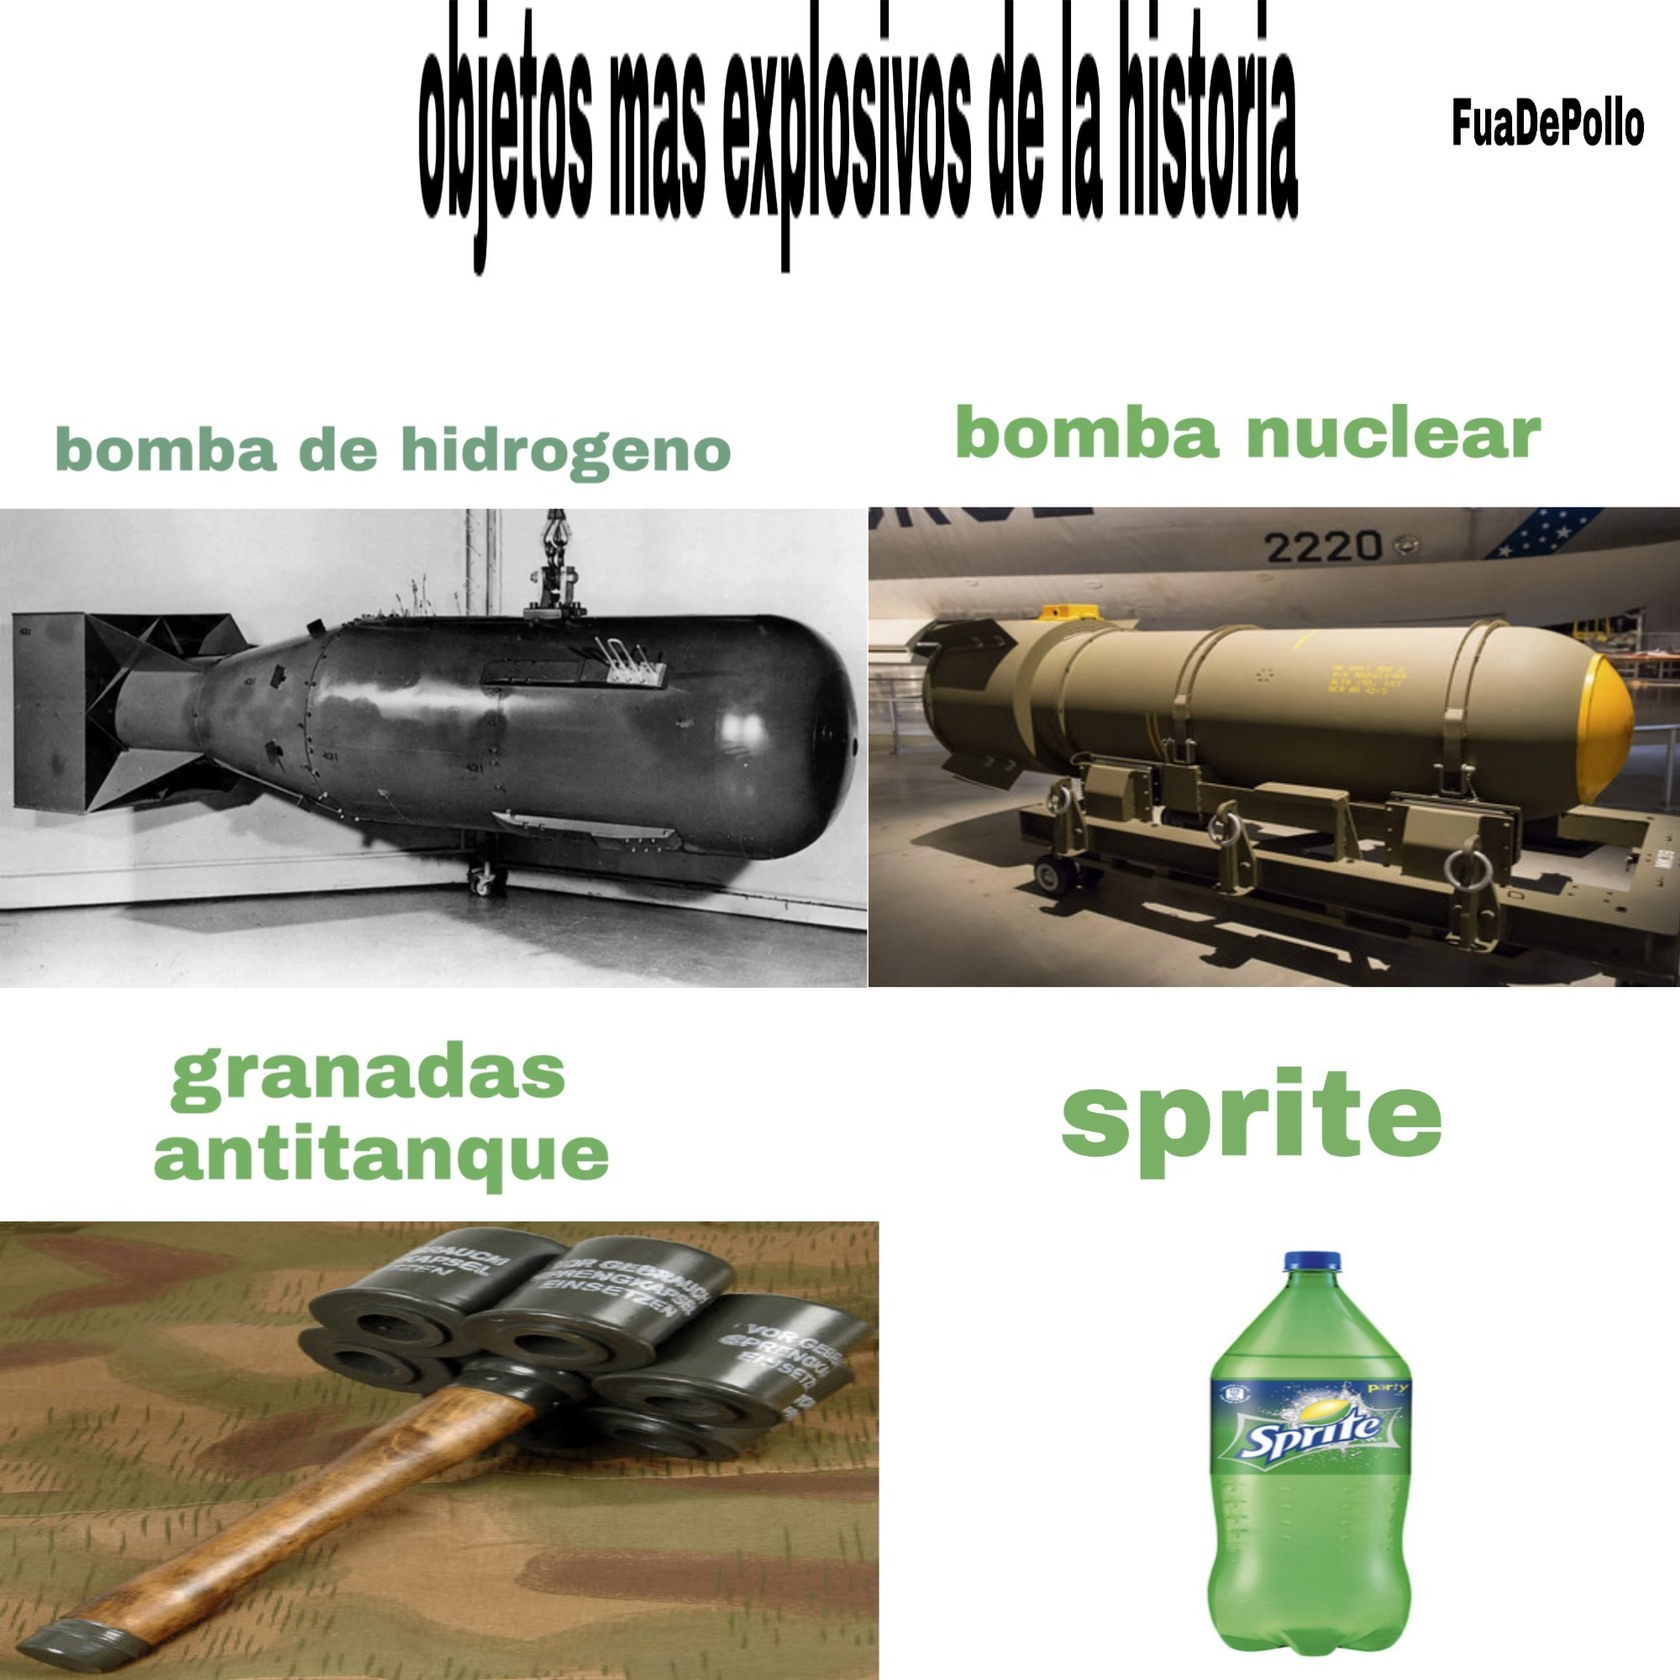 Bumm - meme